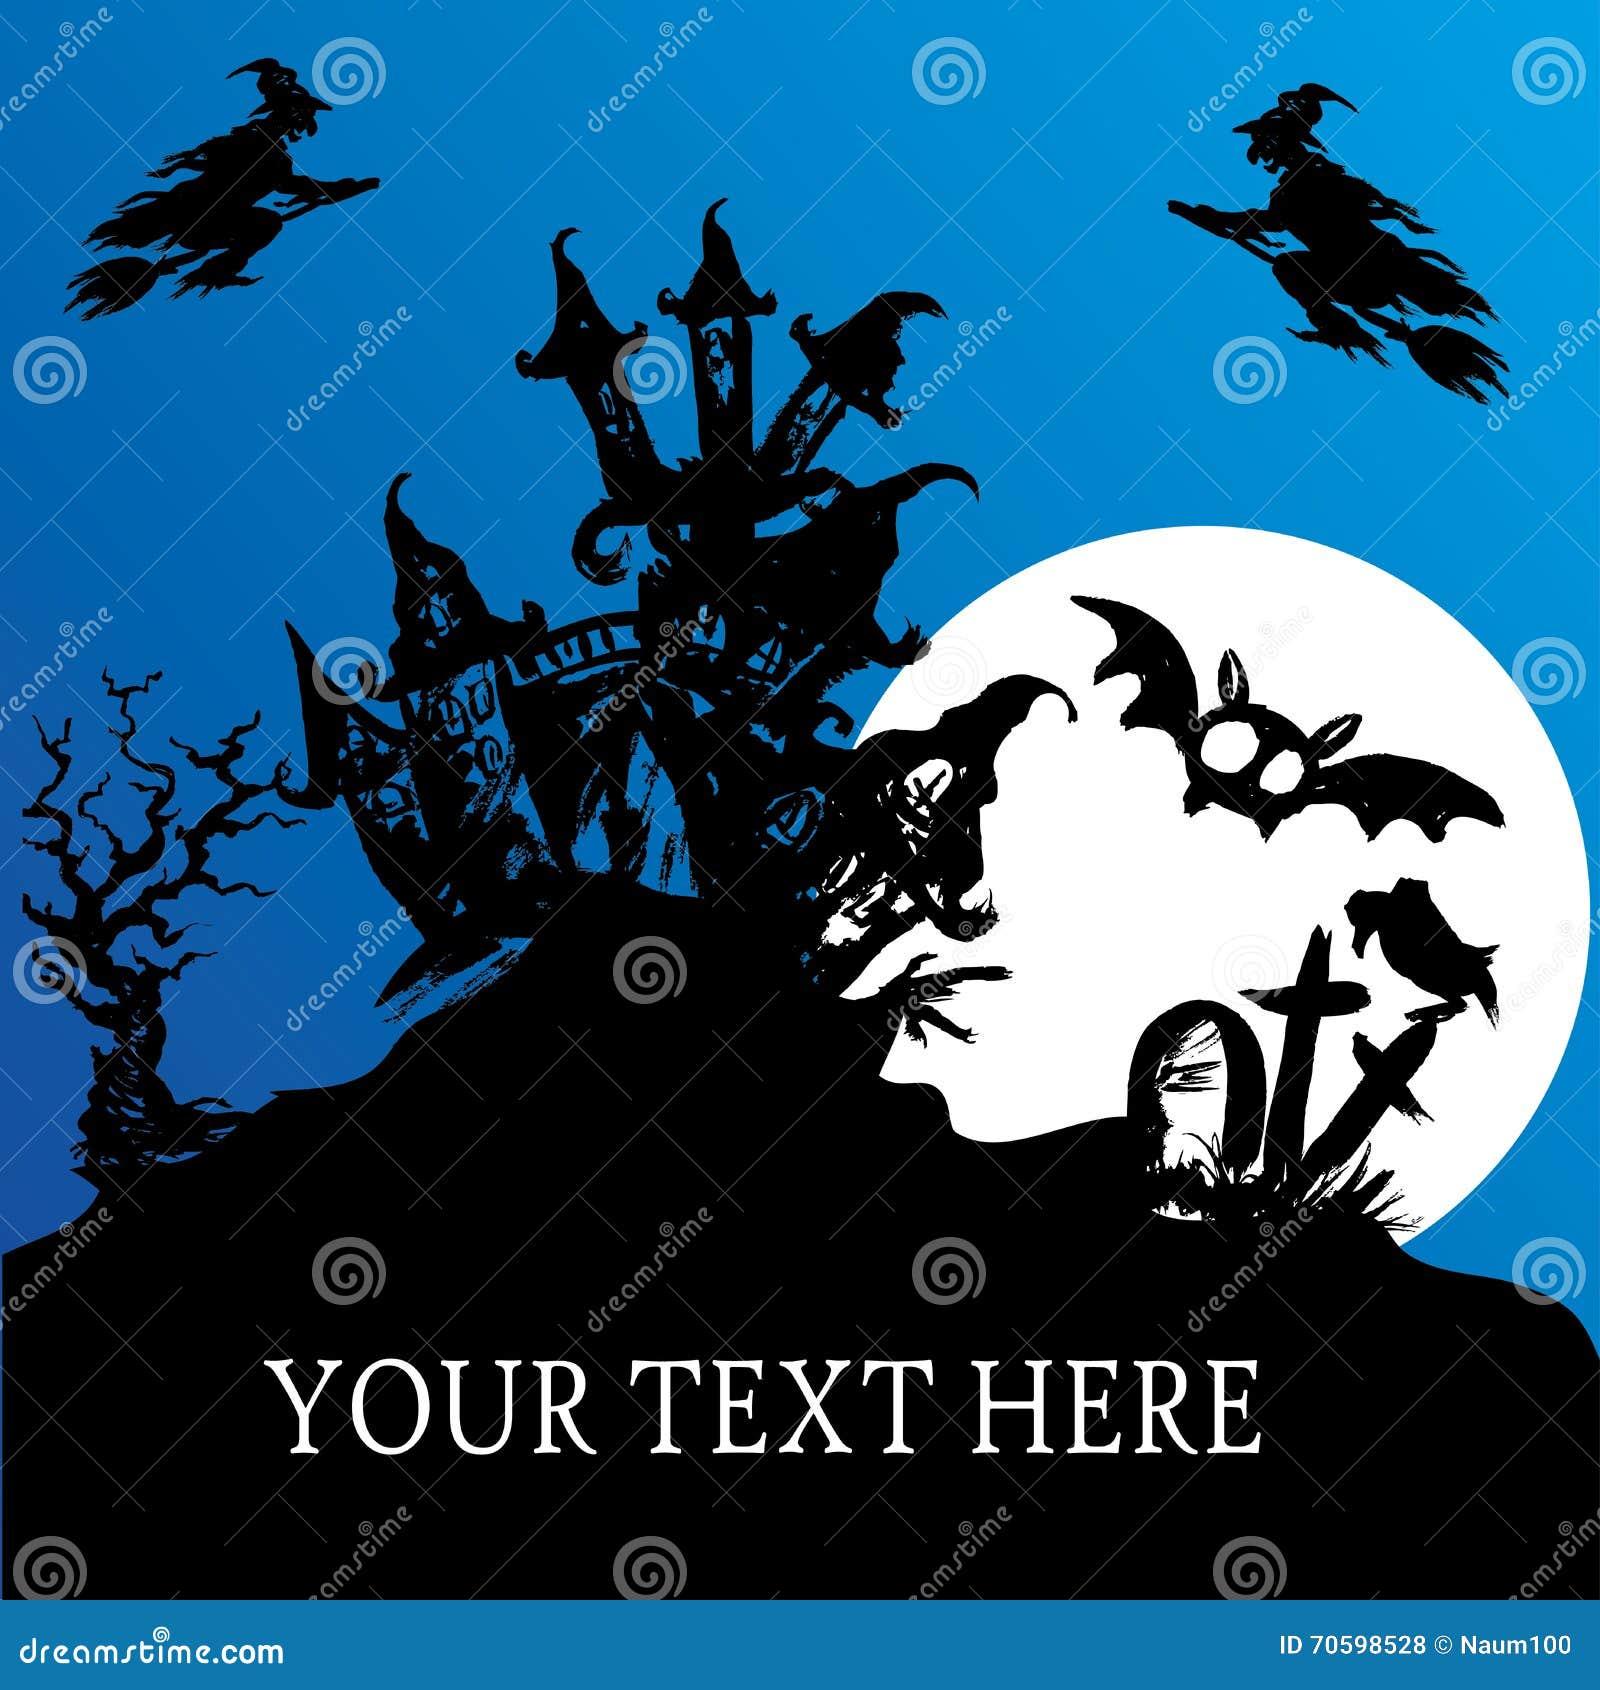 Halloween Haunted House Stock Vector - Image: 70598528